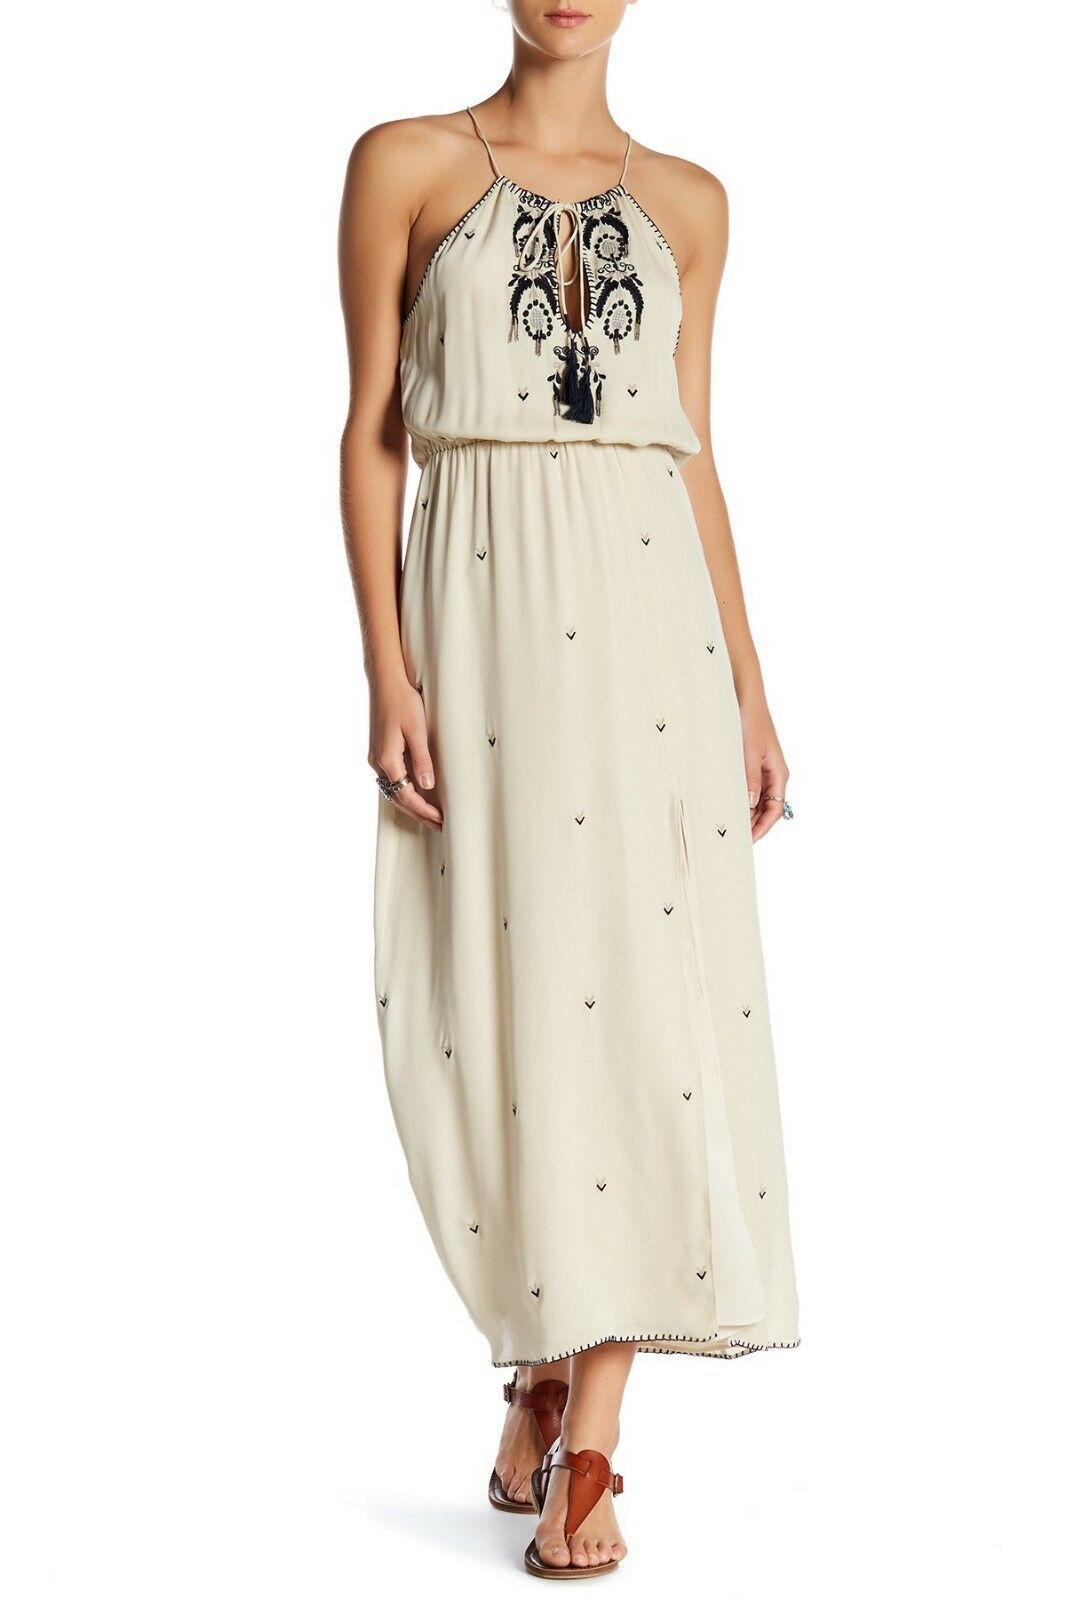 HAUTE HIPPIE Antique Antique Antique Talitha Embroidered Beaded Blouson Silk Crepe Maxi Dress S 24708a